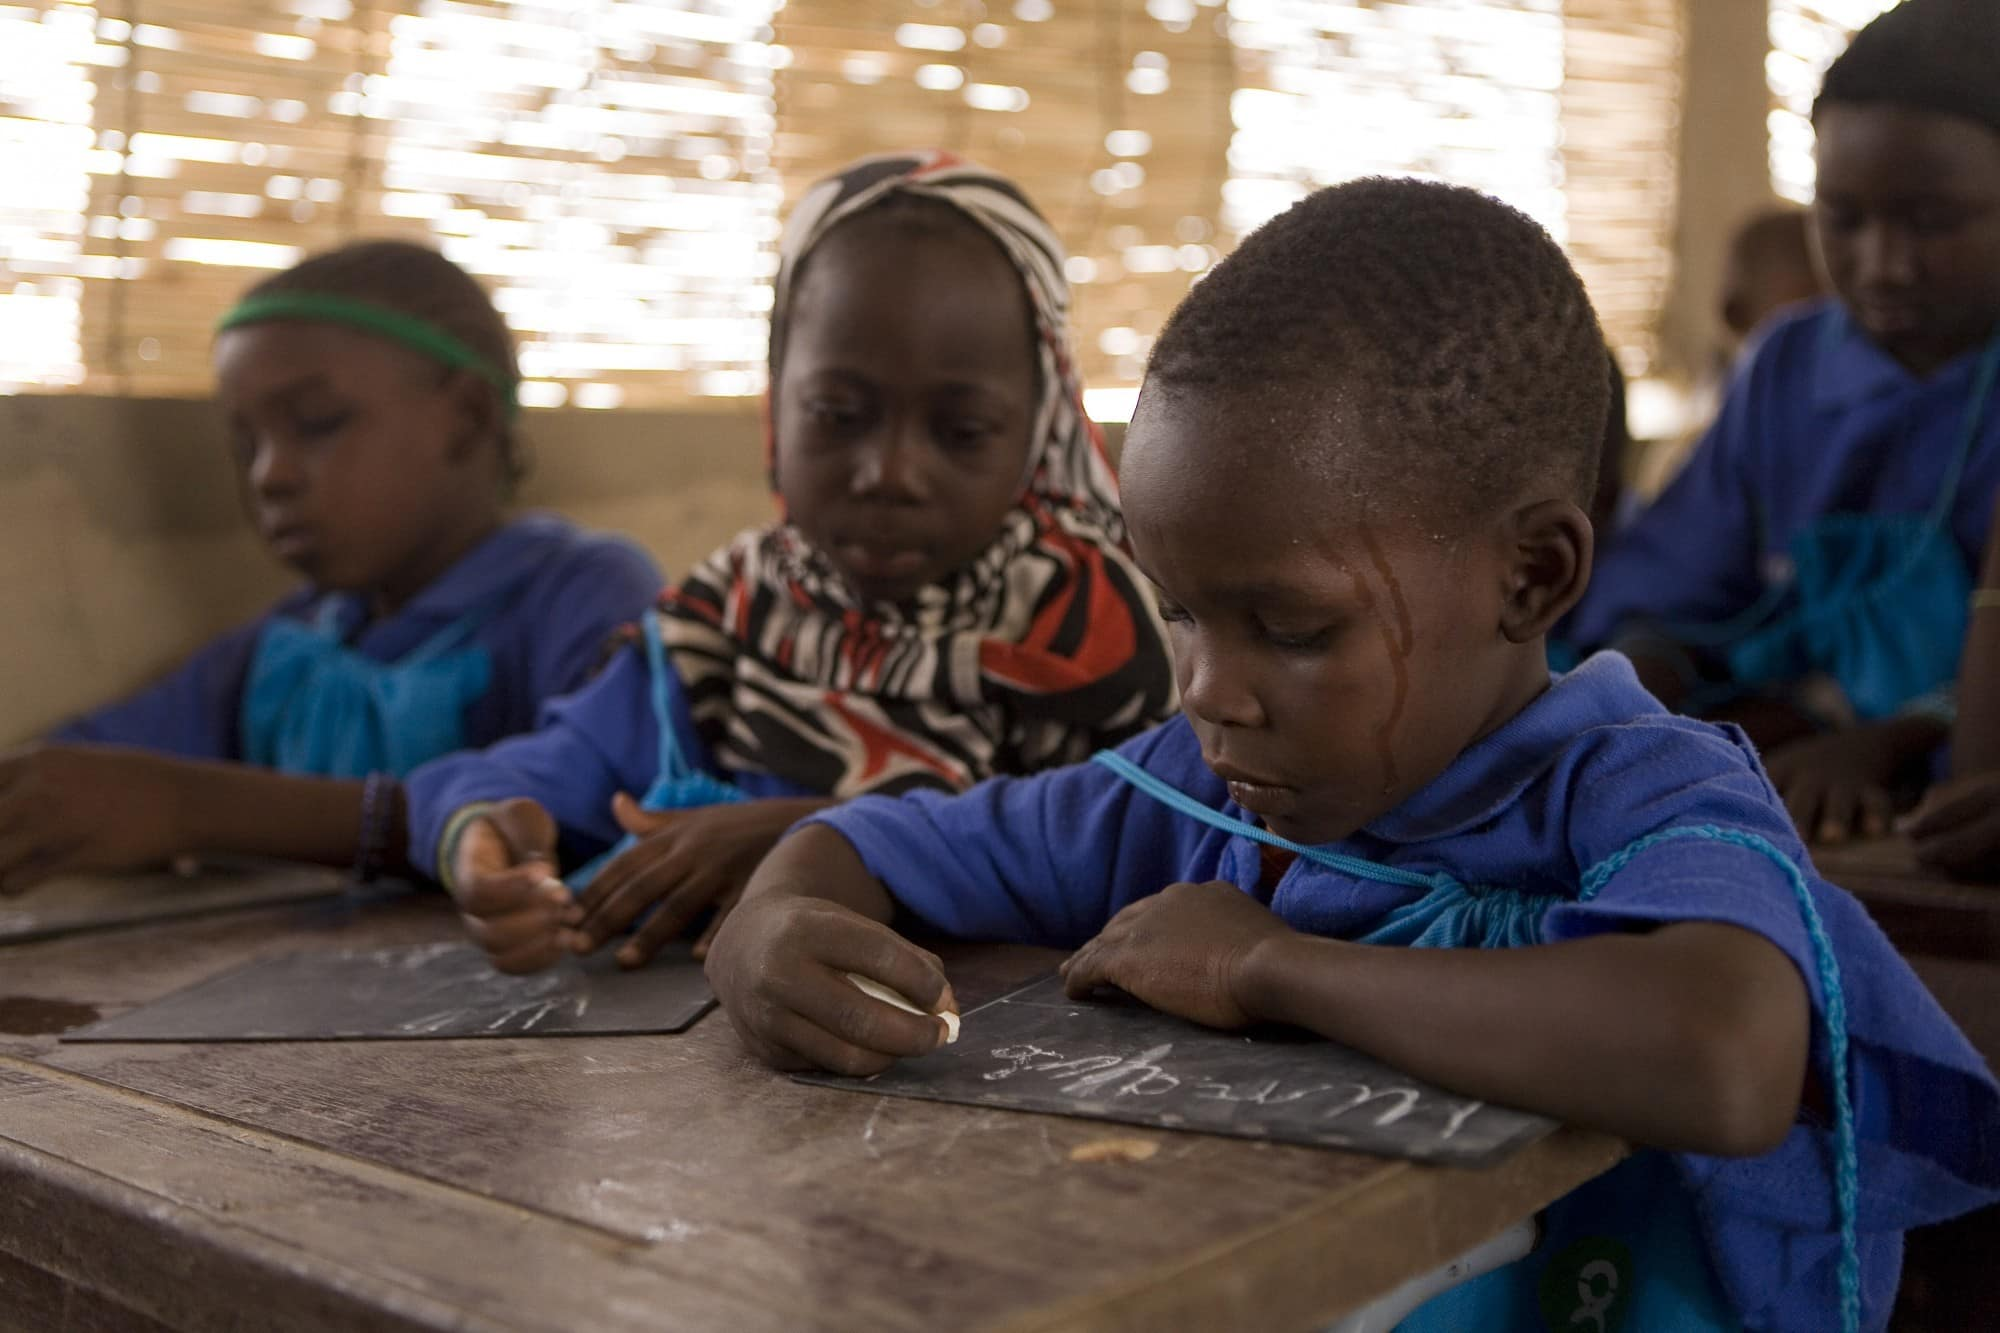 Coinhive fecha e UNICEF pode perder fonte de renda